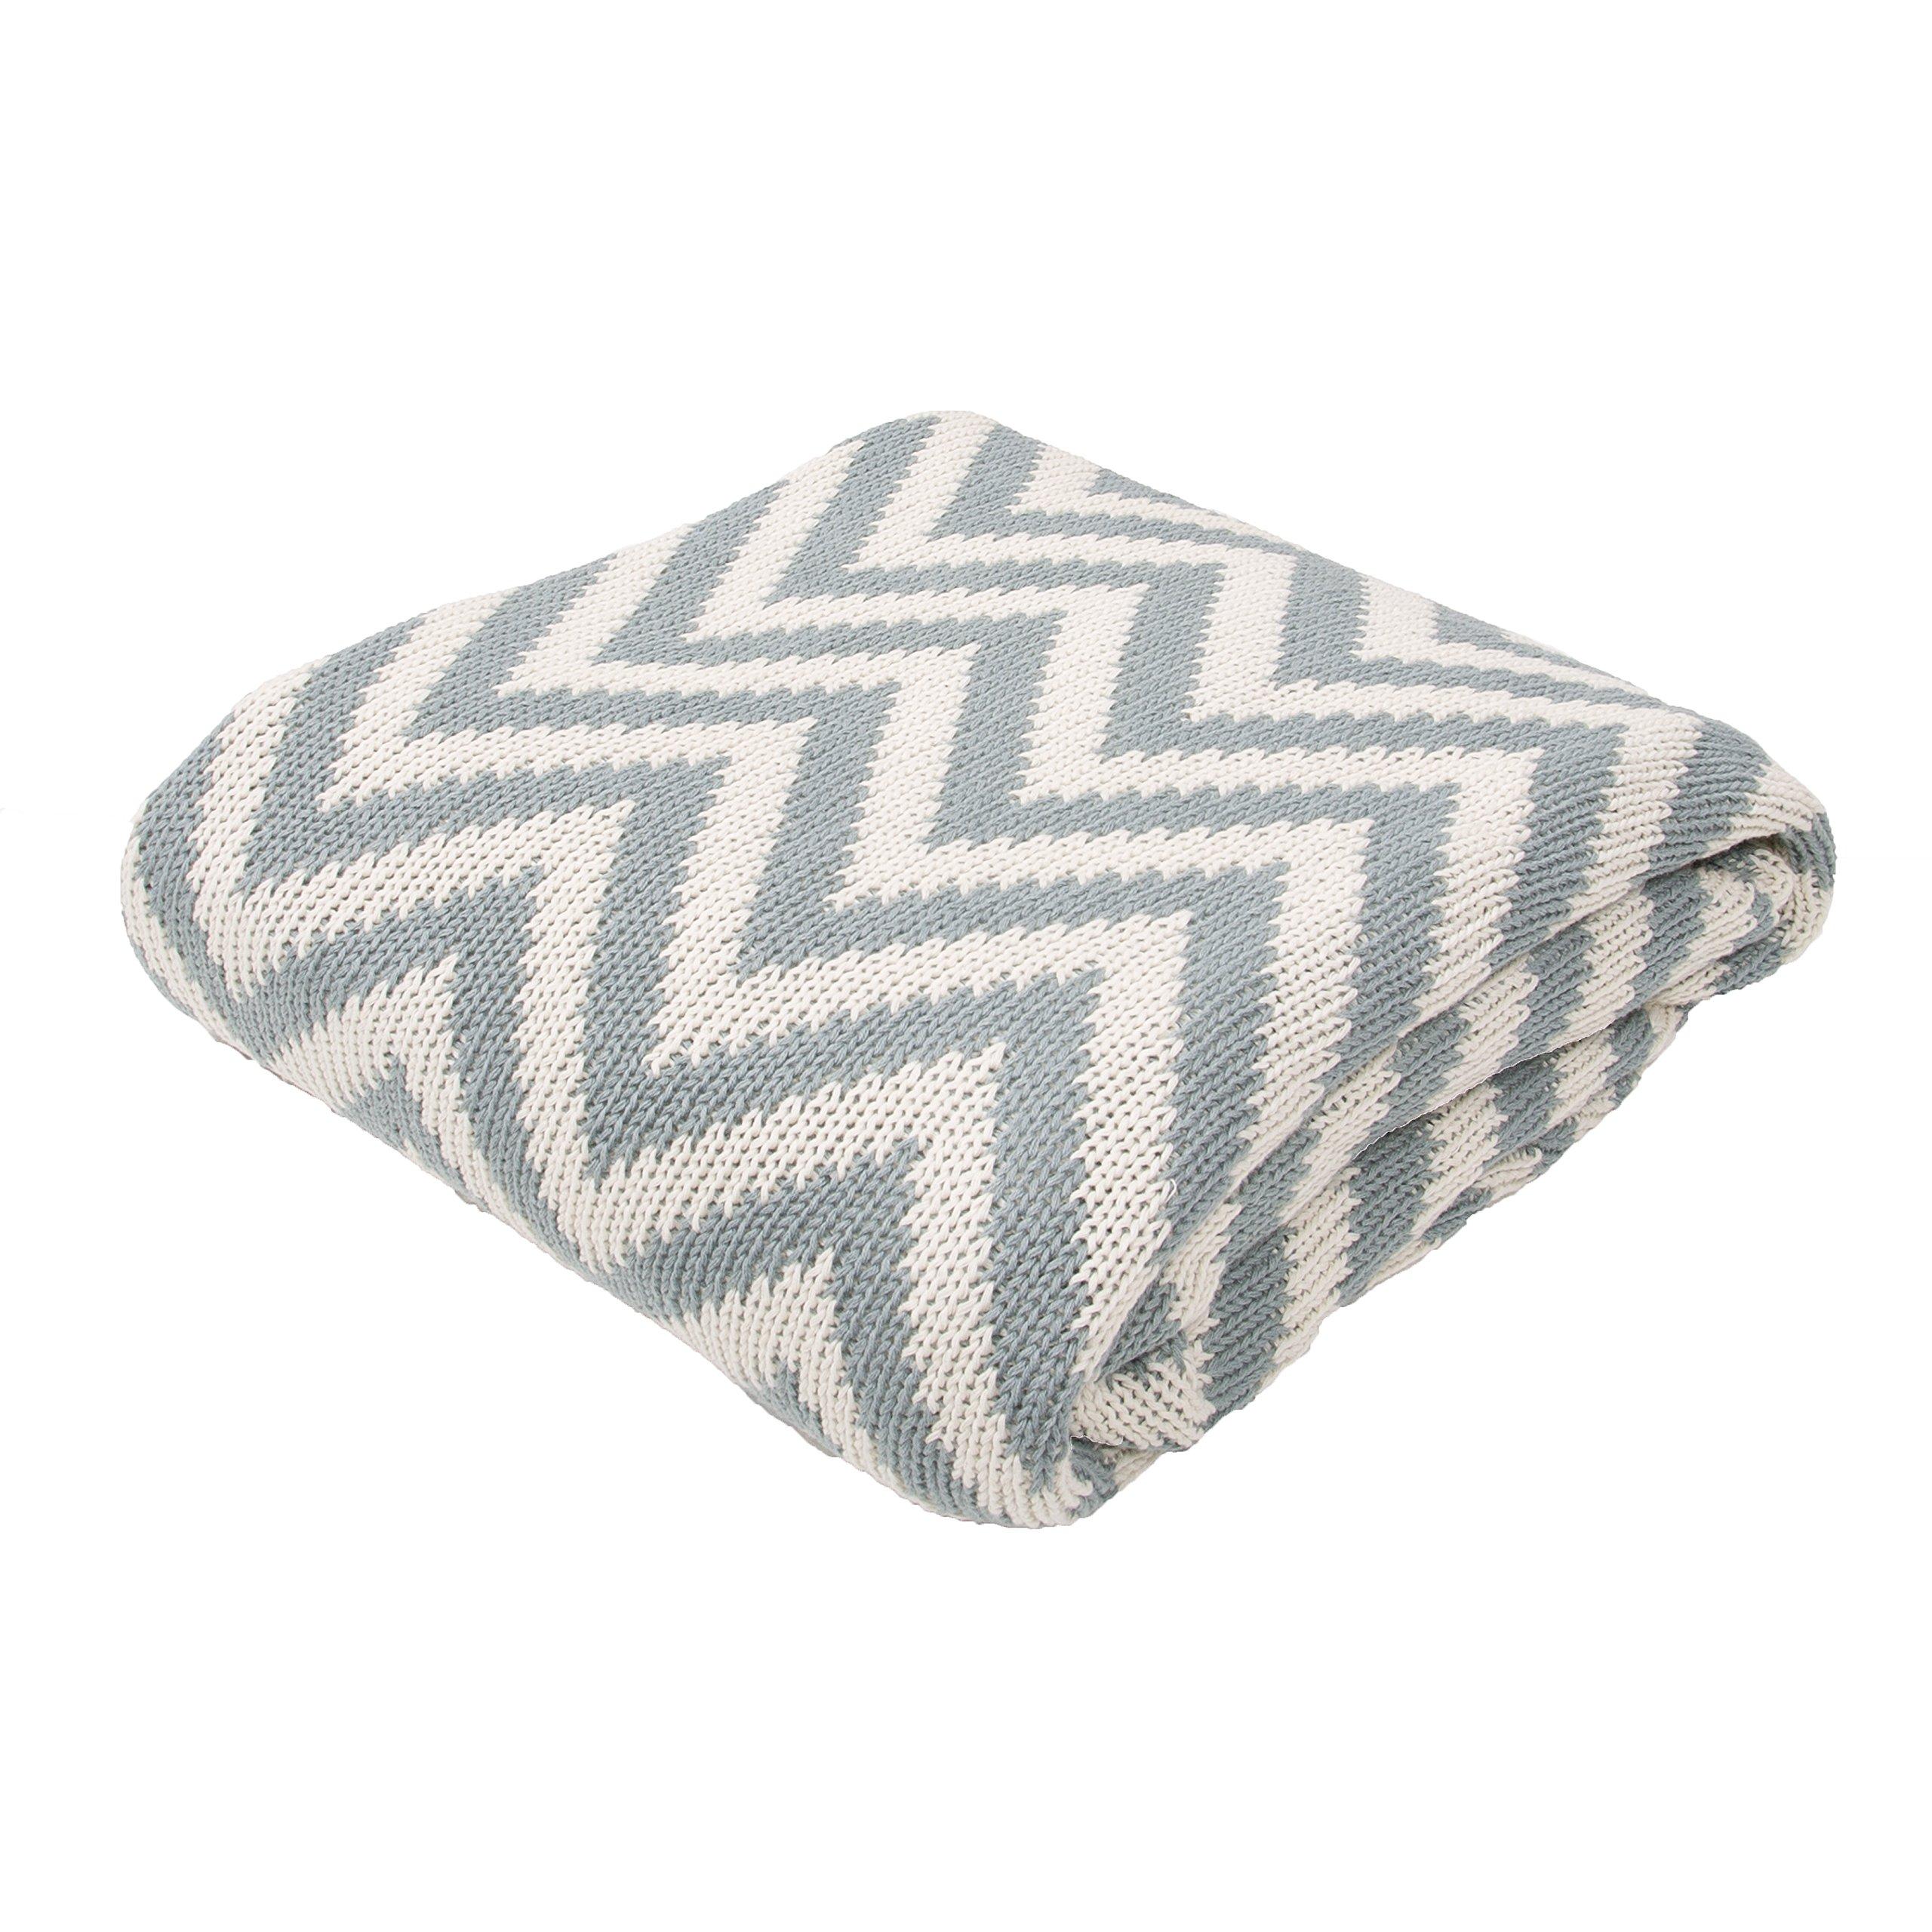 Jaipur Soft Hand Stripe Pattern Gray Cotton Throw, 50-Inch x 60-Inch, Smoke Blue Serin-1